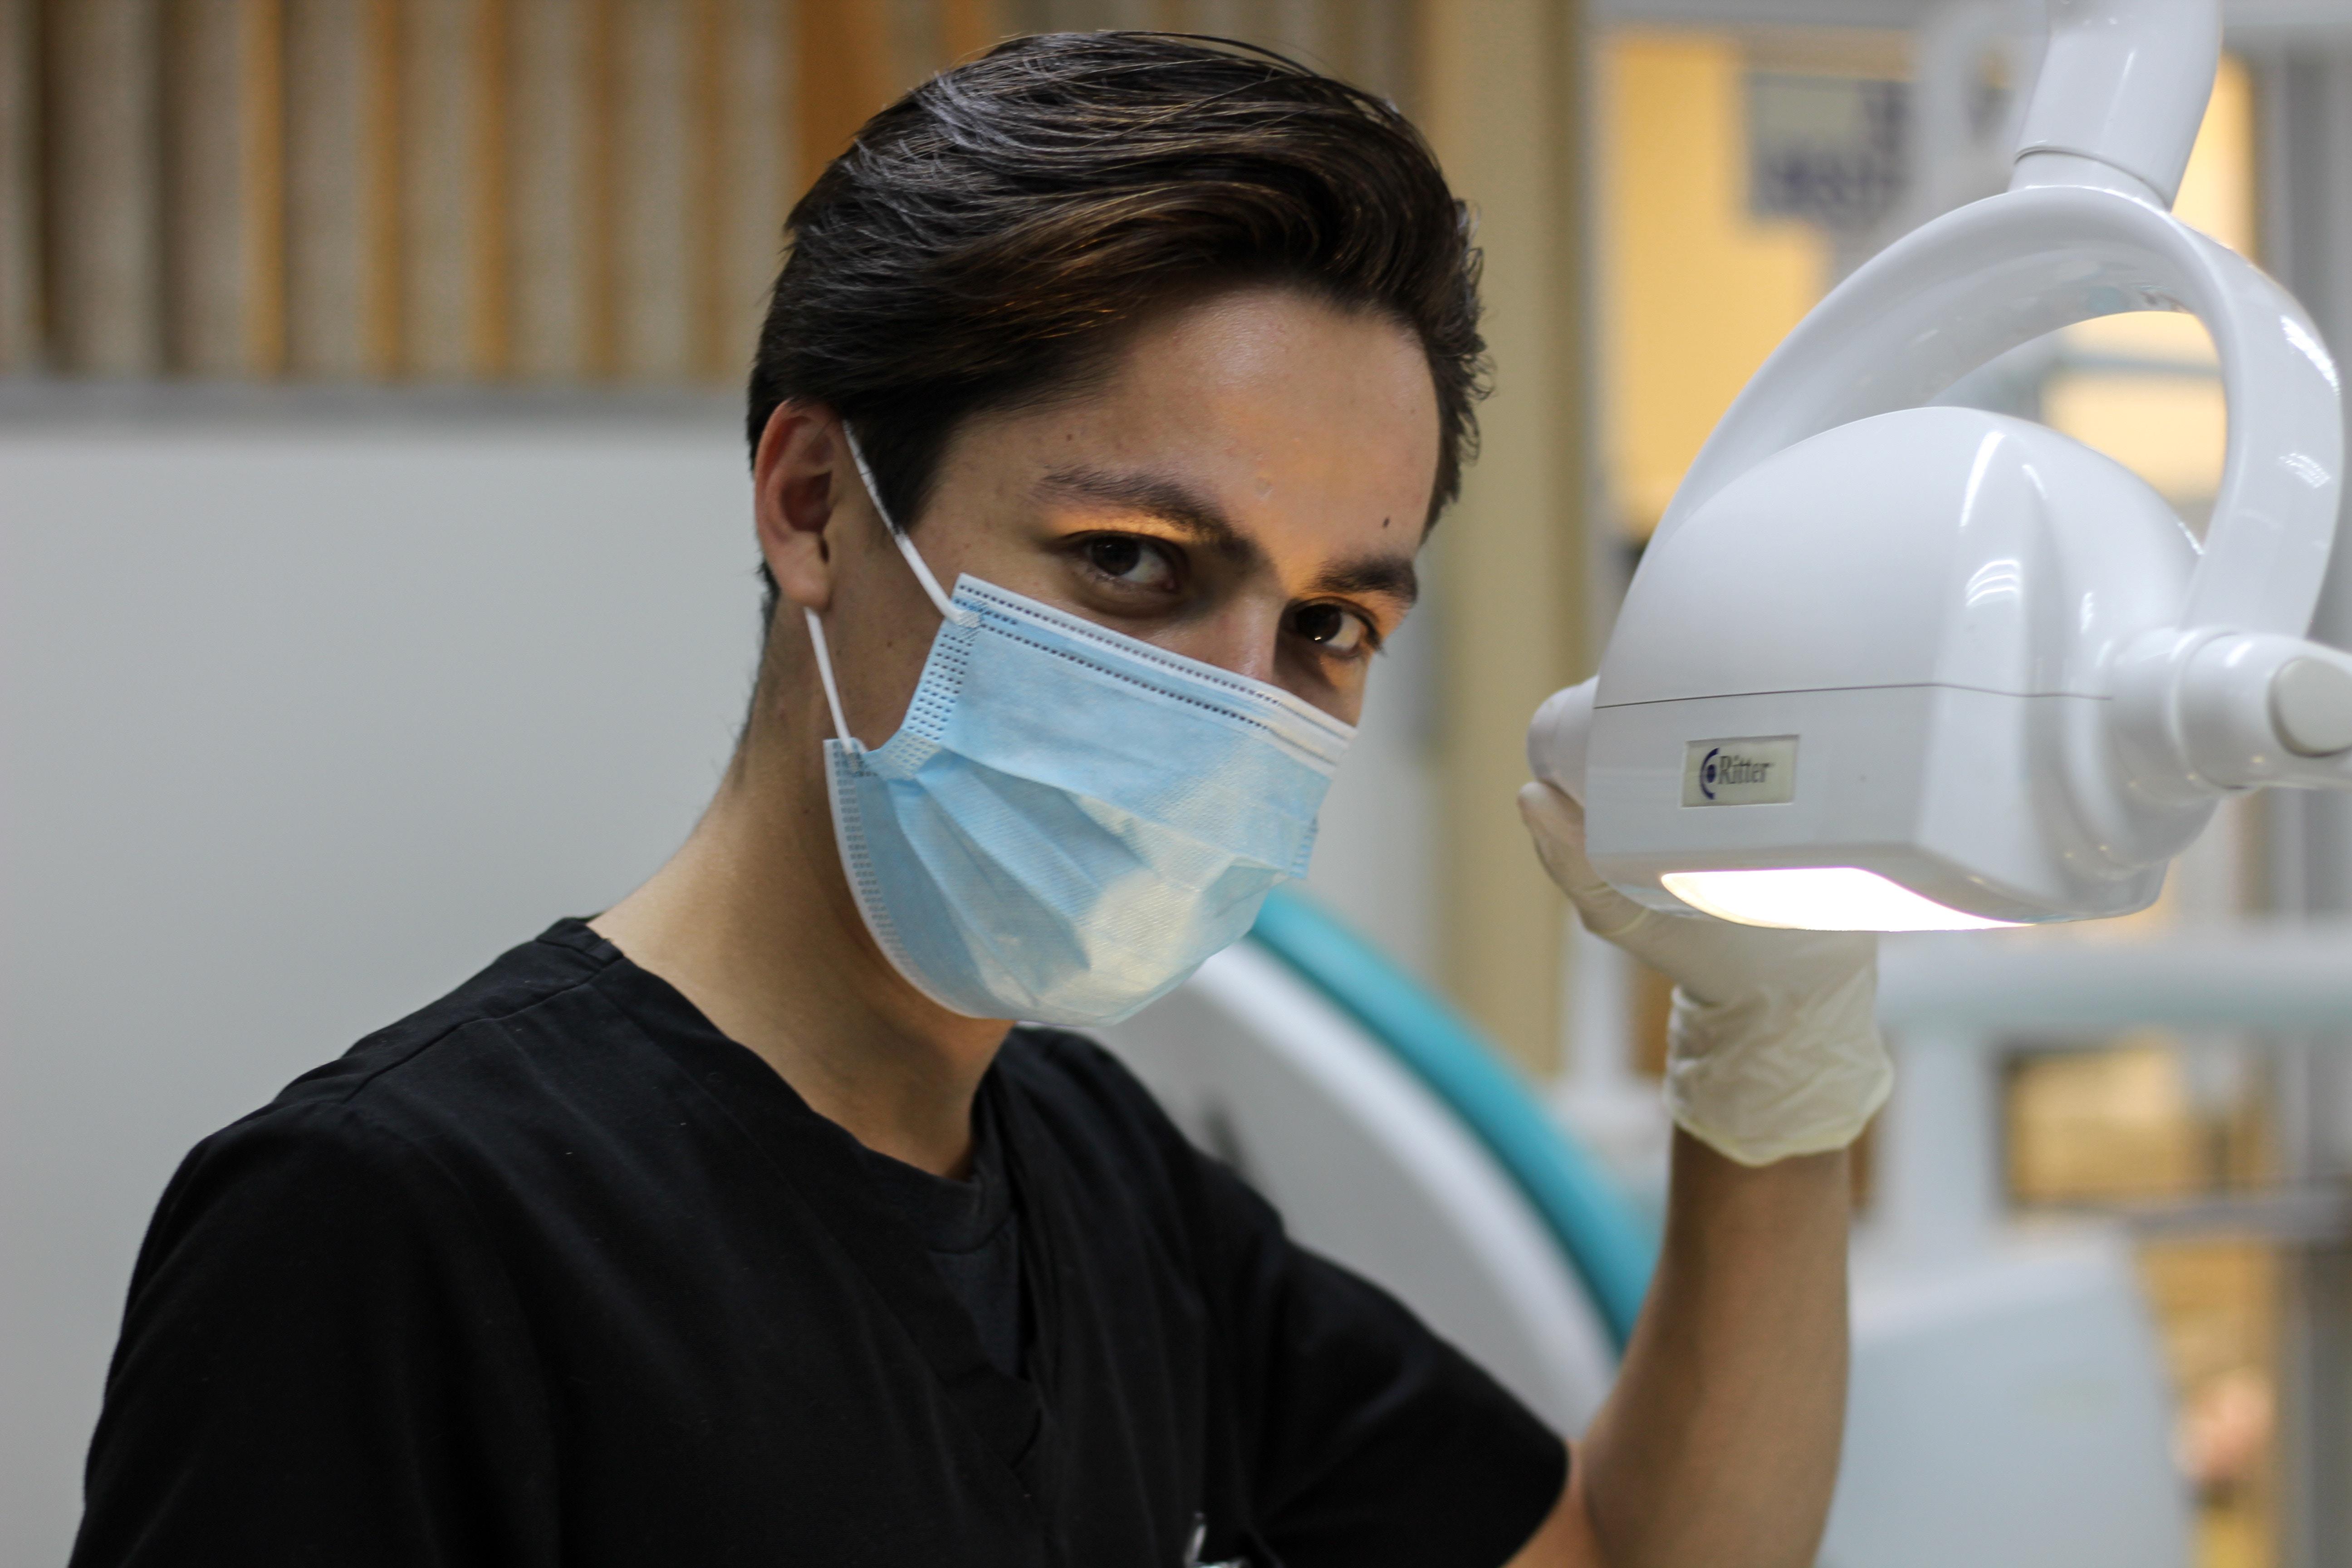 Odontólogo o dentista